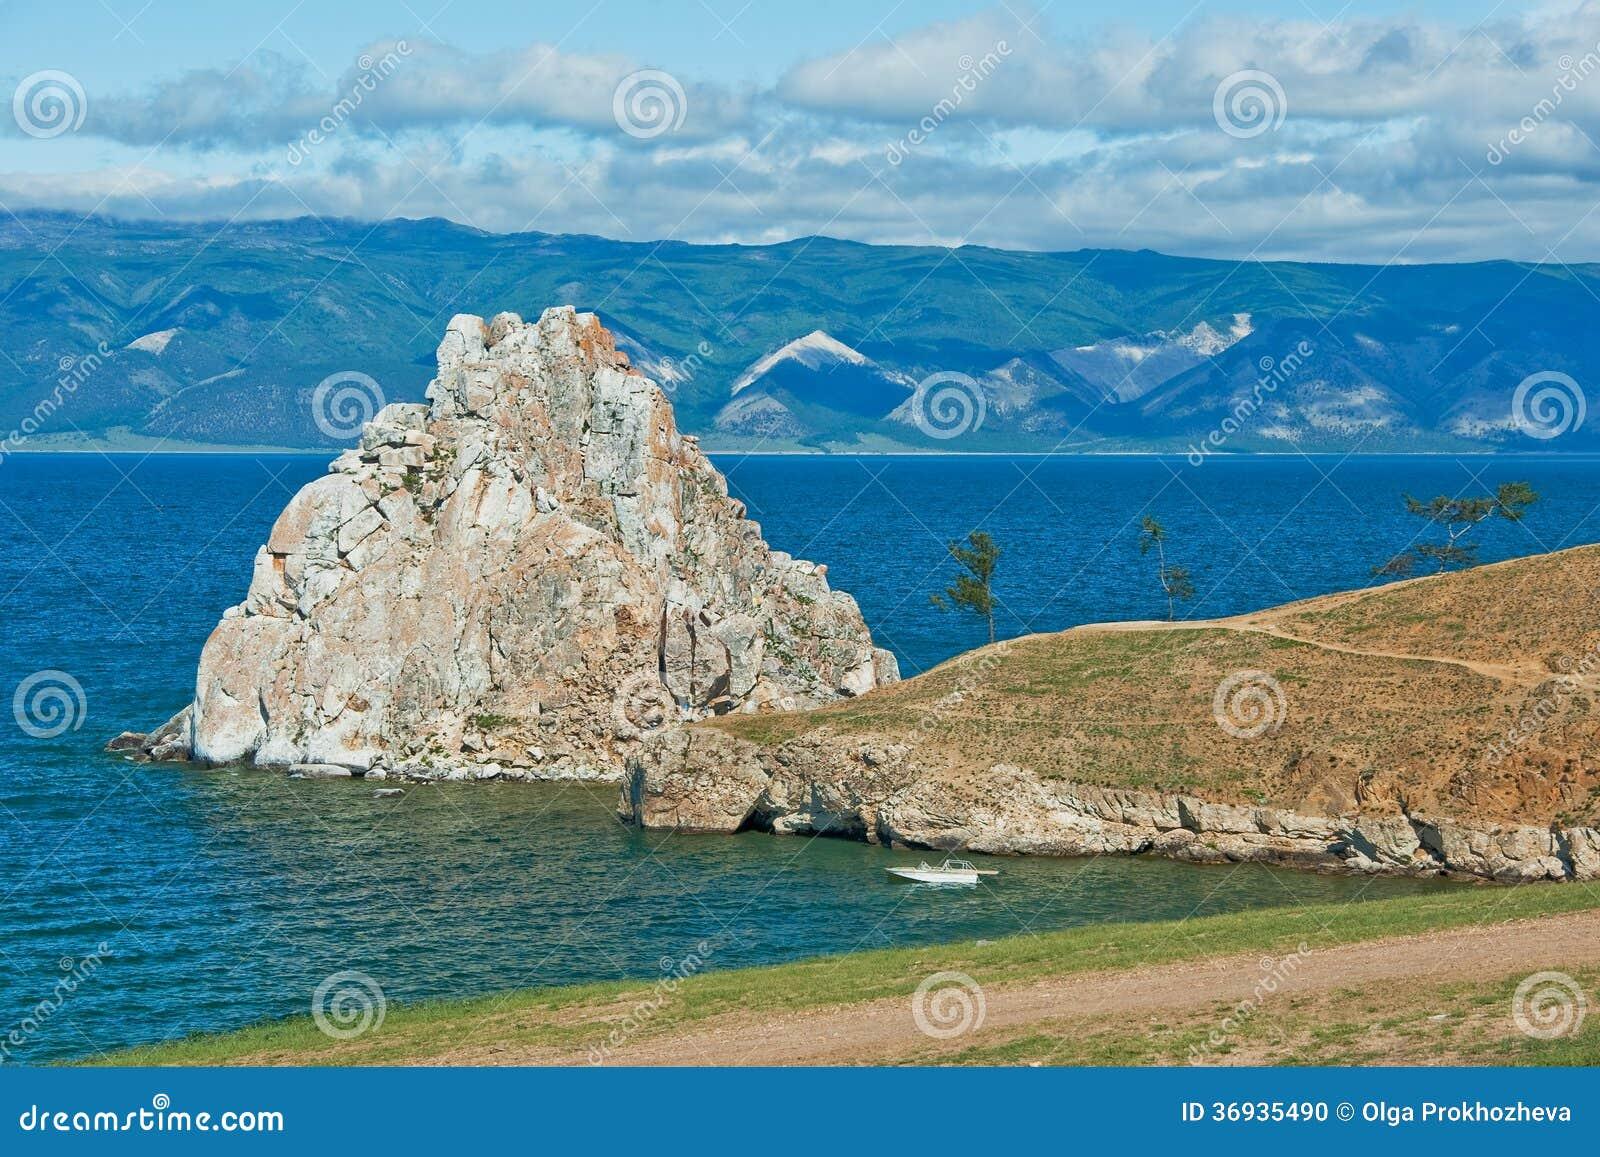 Shaman rock on Olkhon Island (Lake Baikal, Russia).